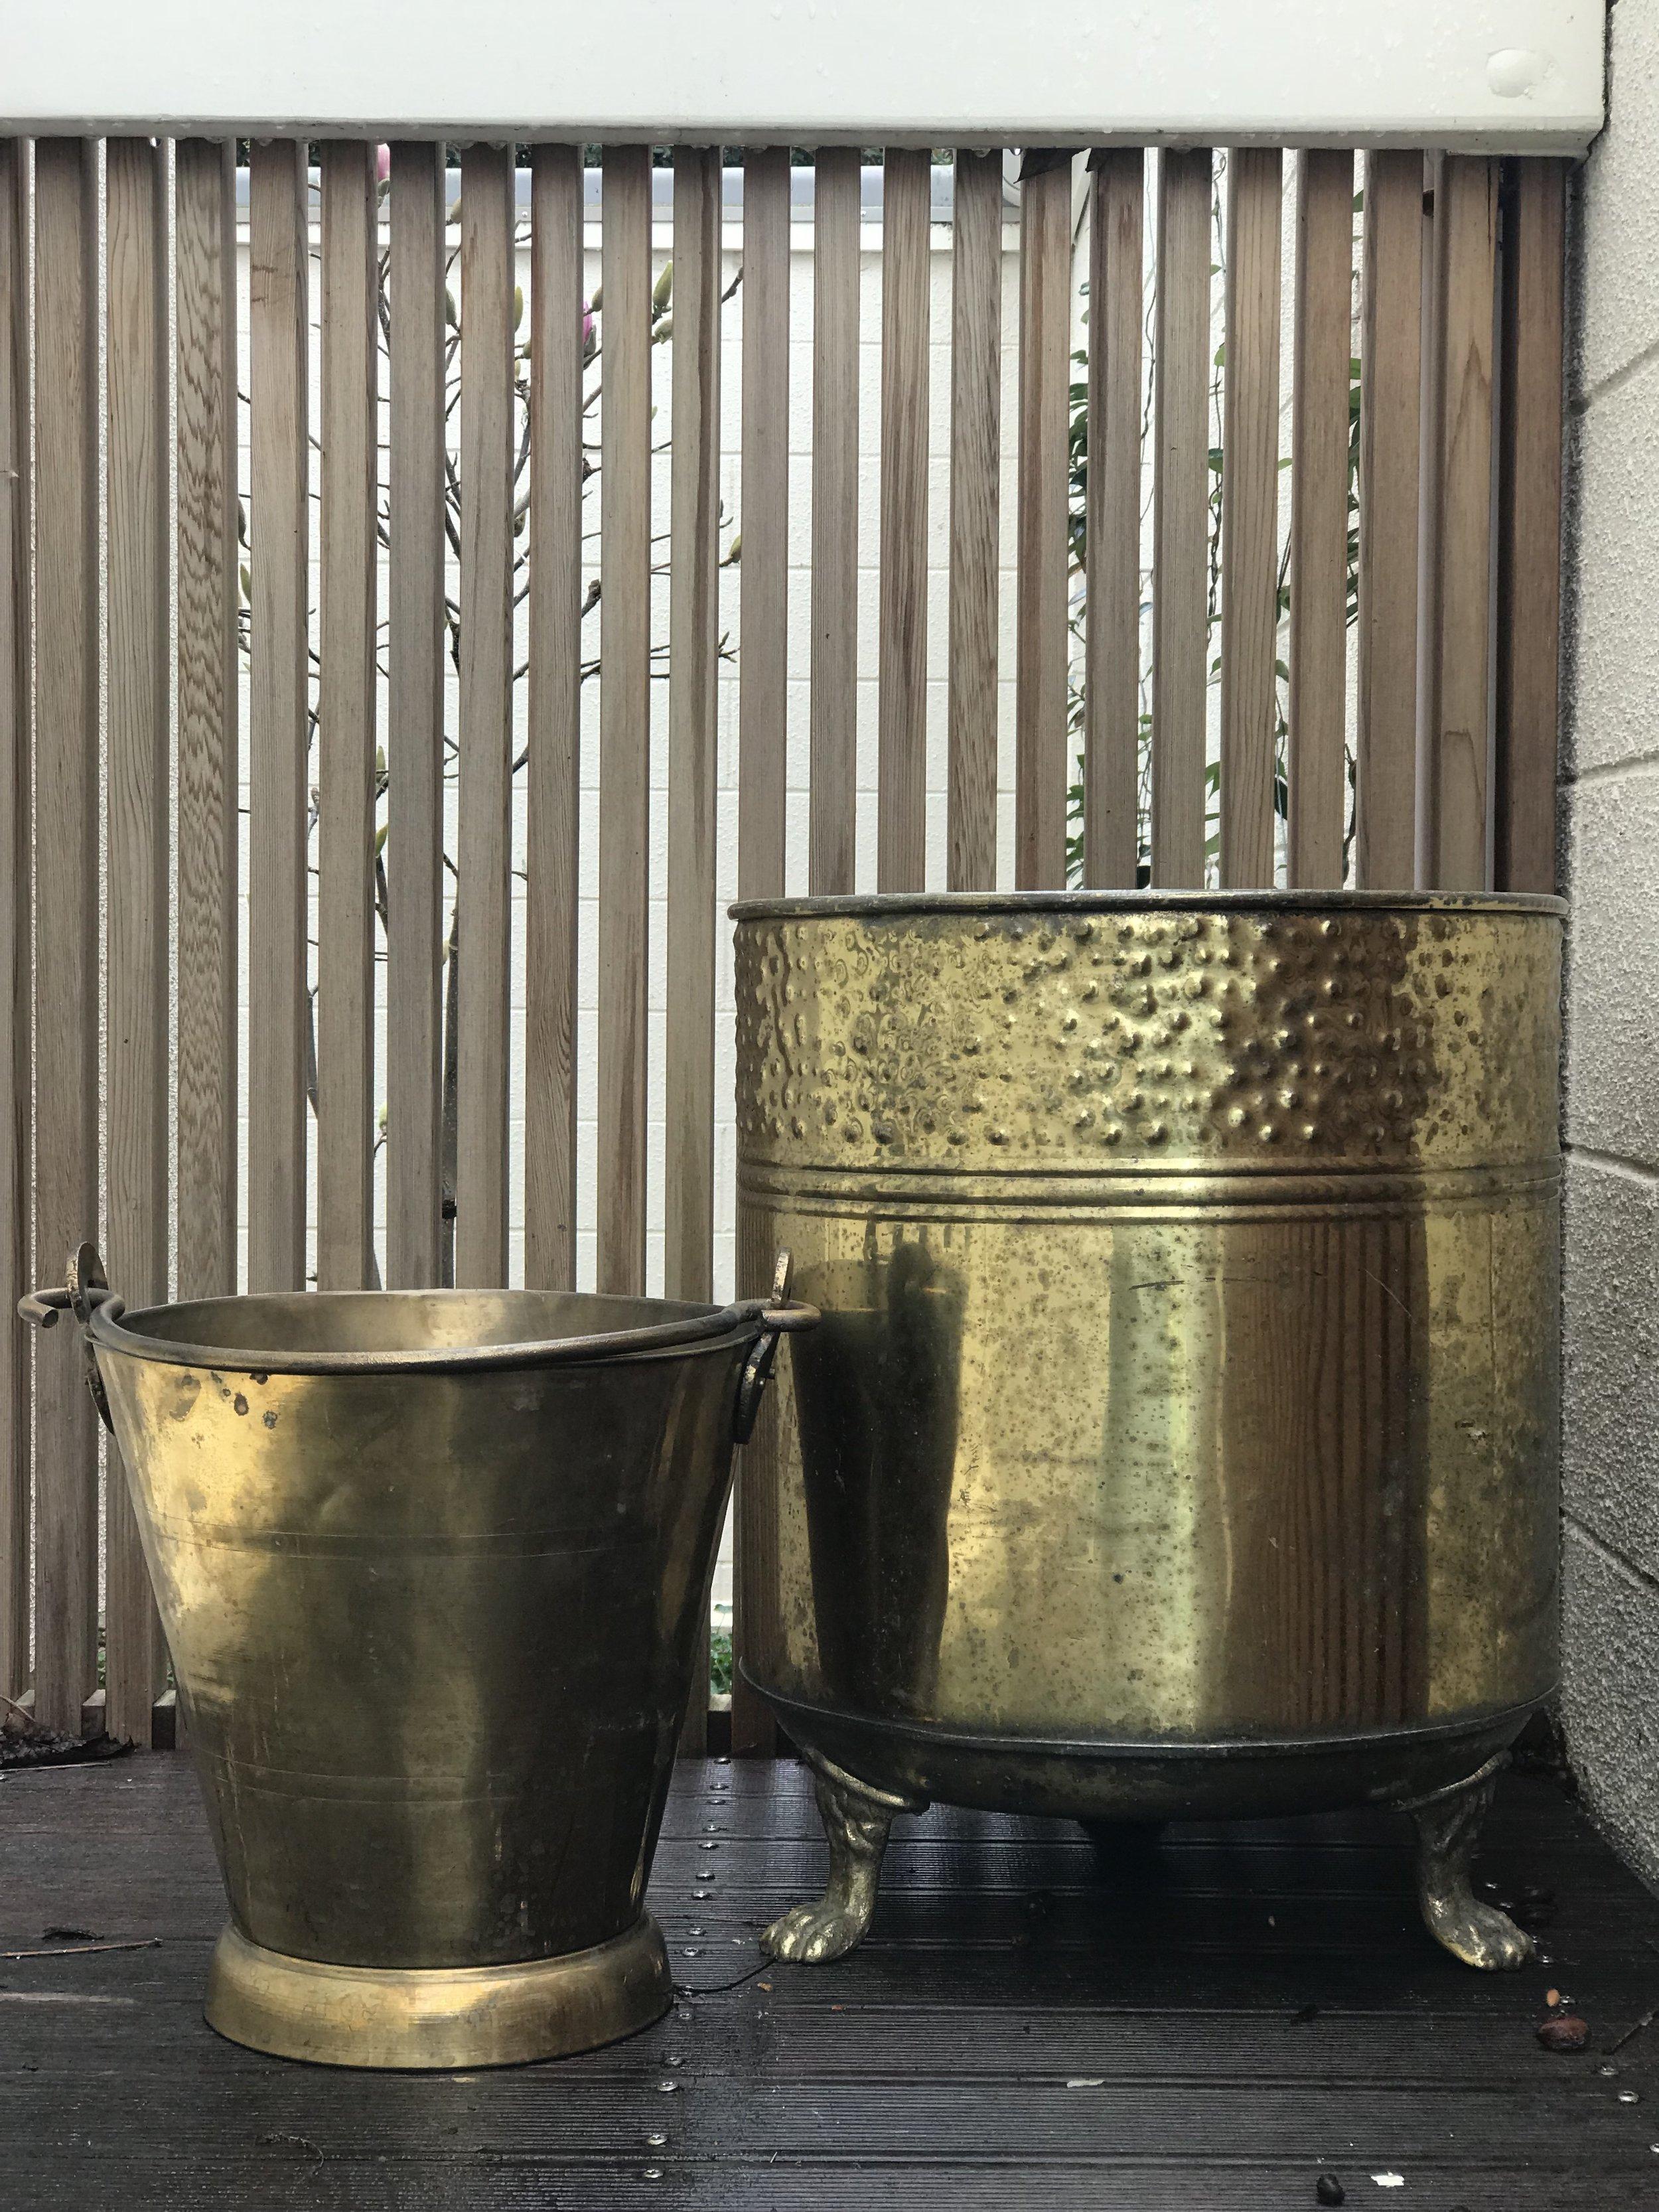 Large Brass Tubs I $10.00 I Qty 4